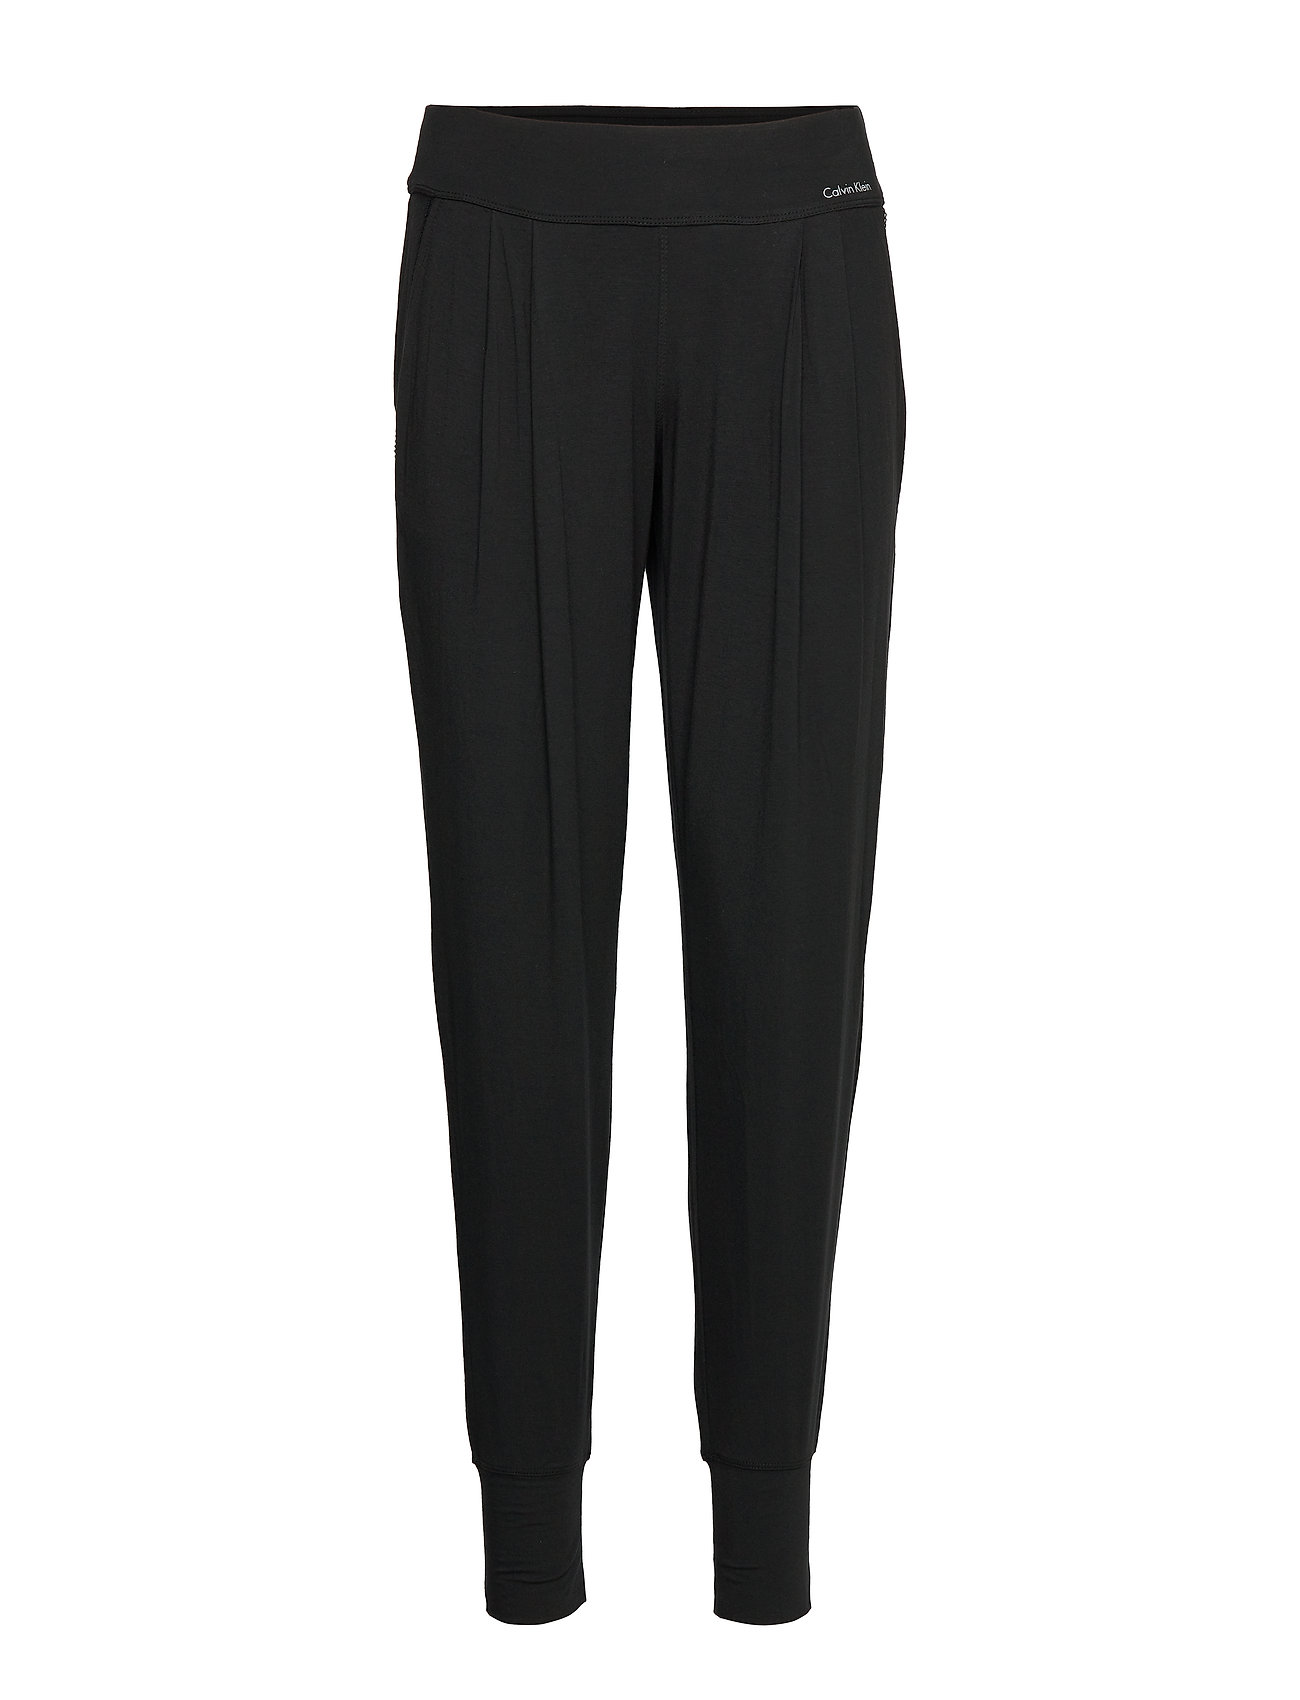 Calvin Klein SLEEP PANT - BLACK